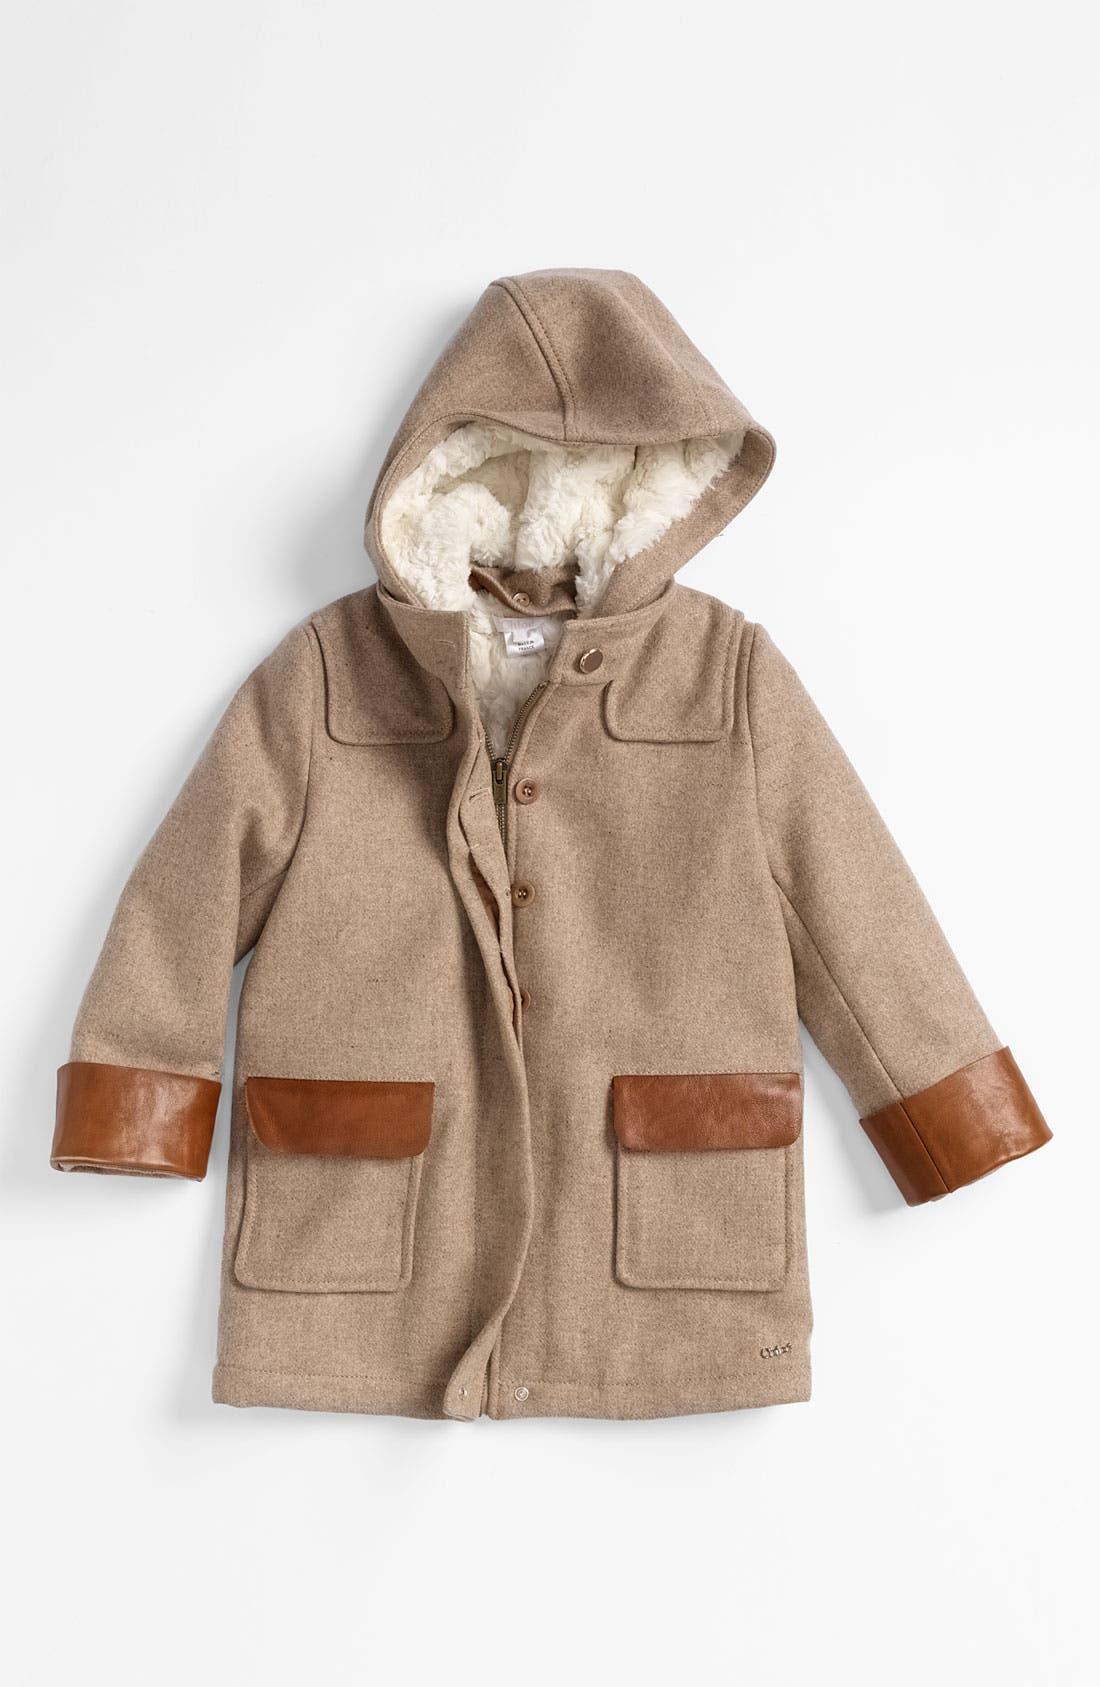 Alternate Image 1 Selected - Chloé Hooded Wool Blend Coat (Little Girls & Big Girls)